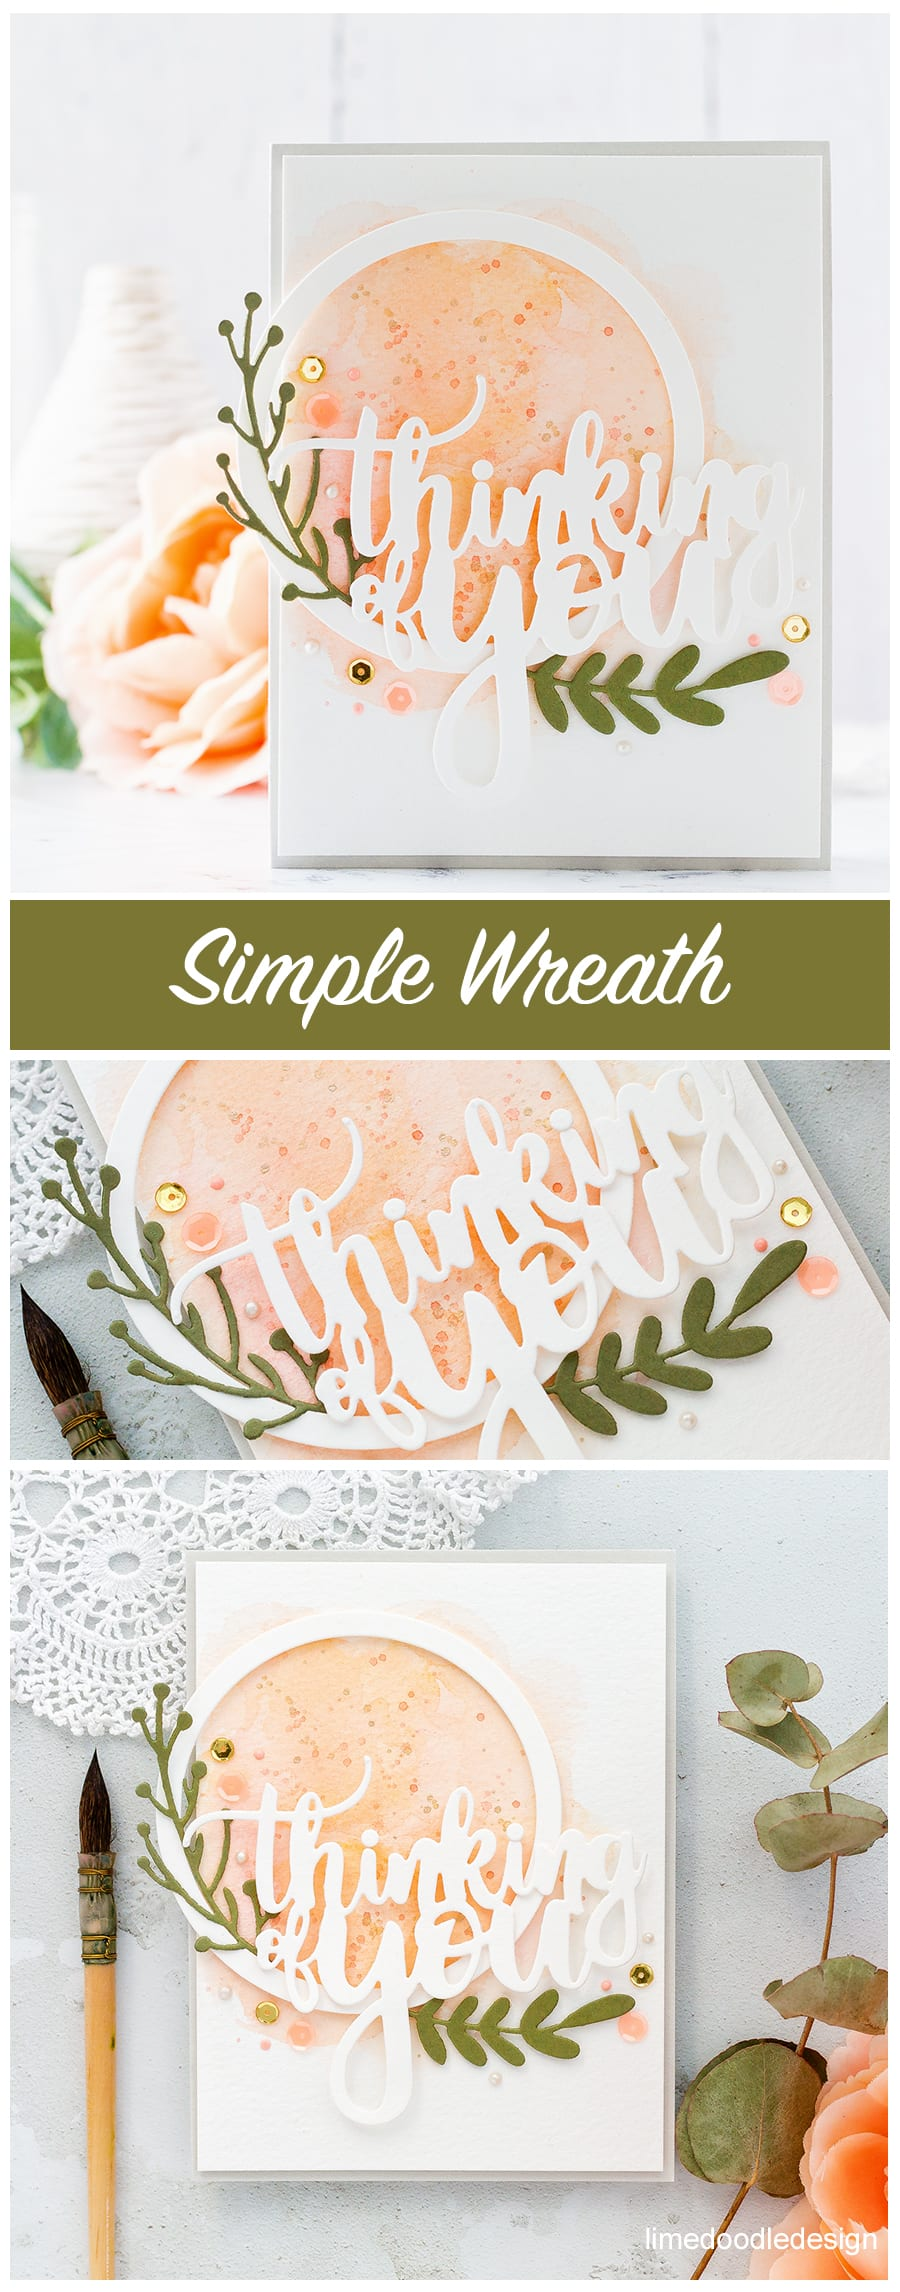 Simple die cut wreath handmade card by Debby Hughes using Altenew's Create A Wreath die set. Find out more here: https://limedoodledesign.com/2018/01/simple-die-cut-wreath/